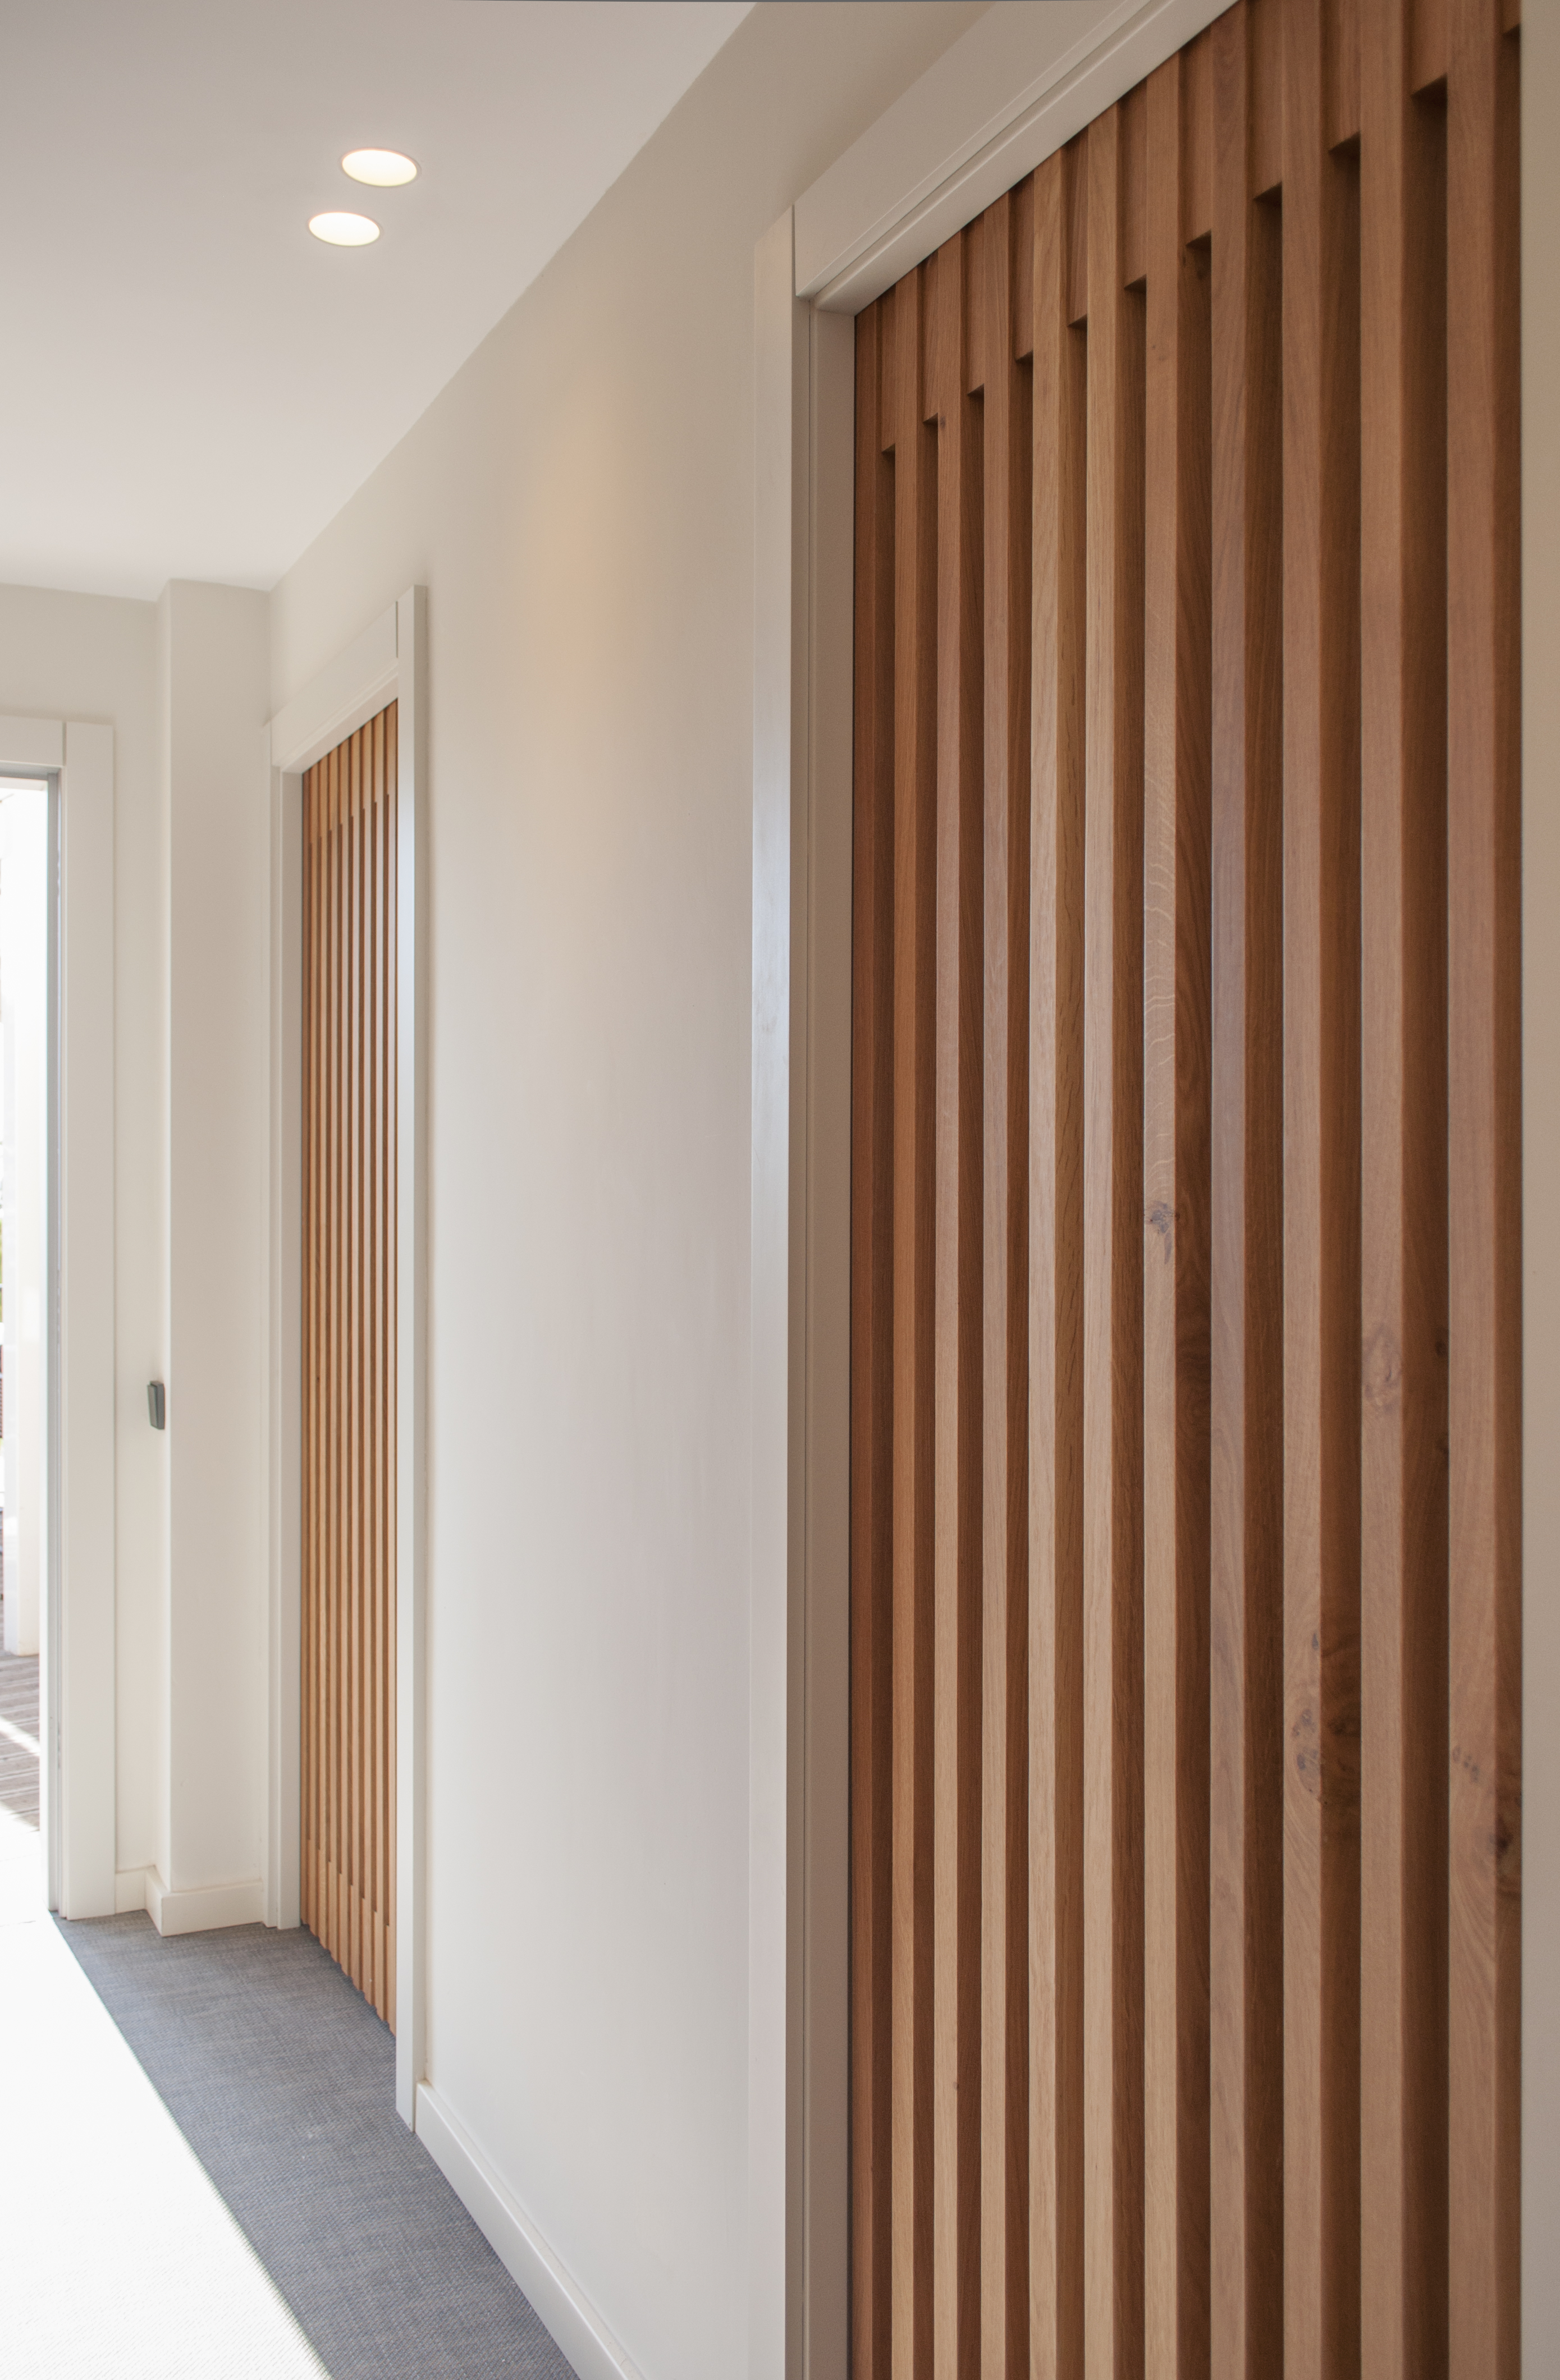 5-arquitectura-sitges-interiorismo-barcelona-puertas-modernas-correderas-madera-iluminacion-moderna